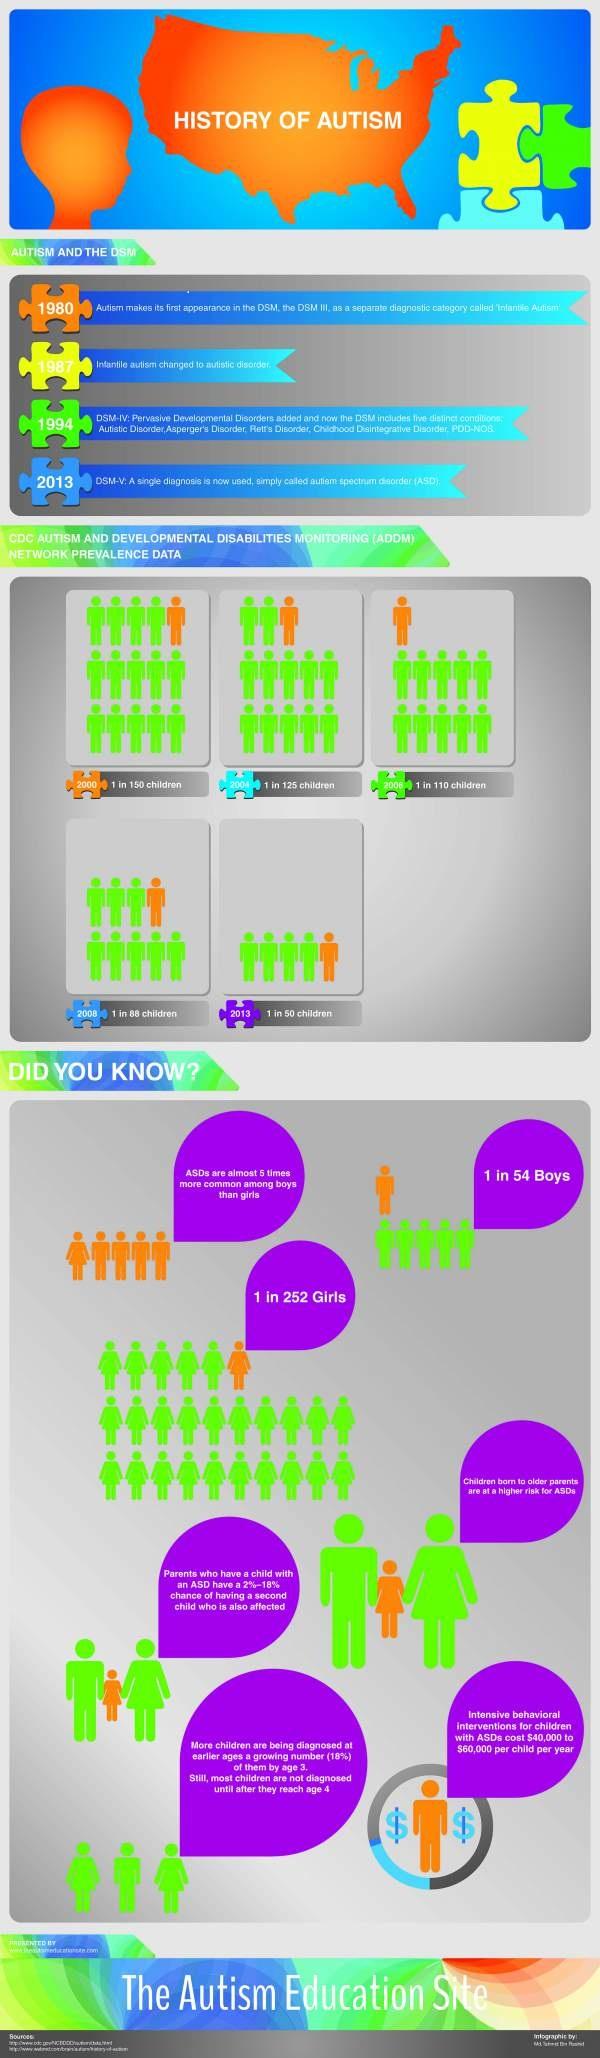 12. historyofautism_infographic